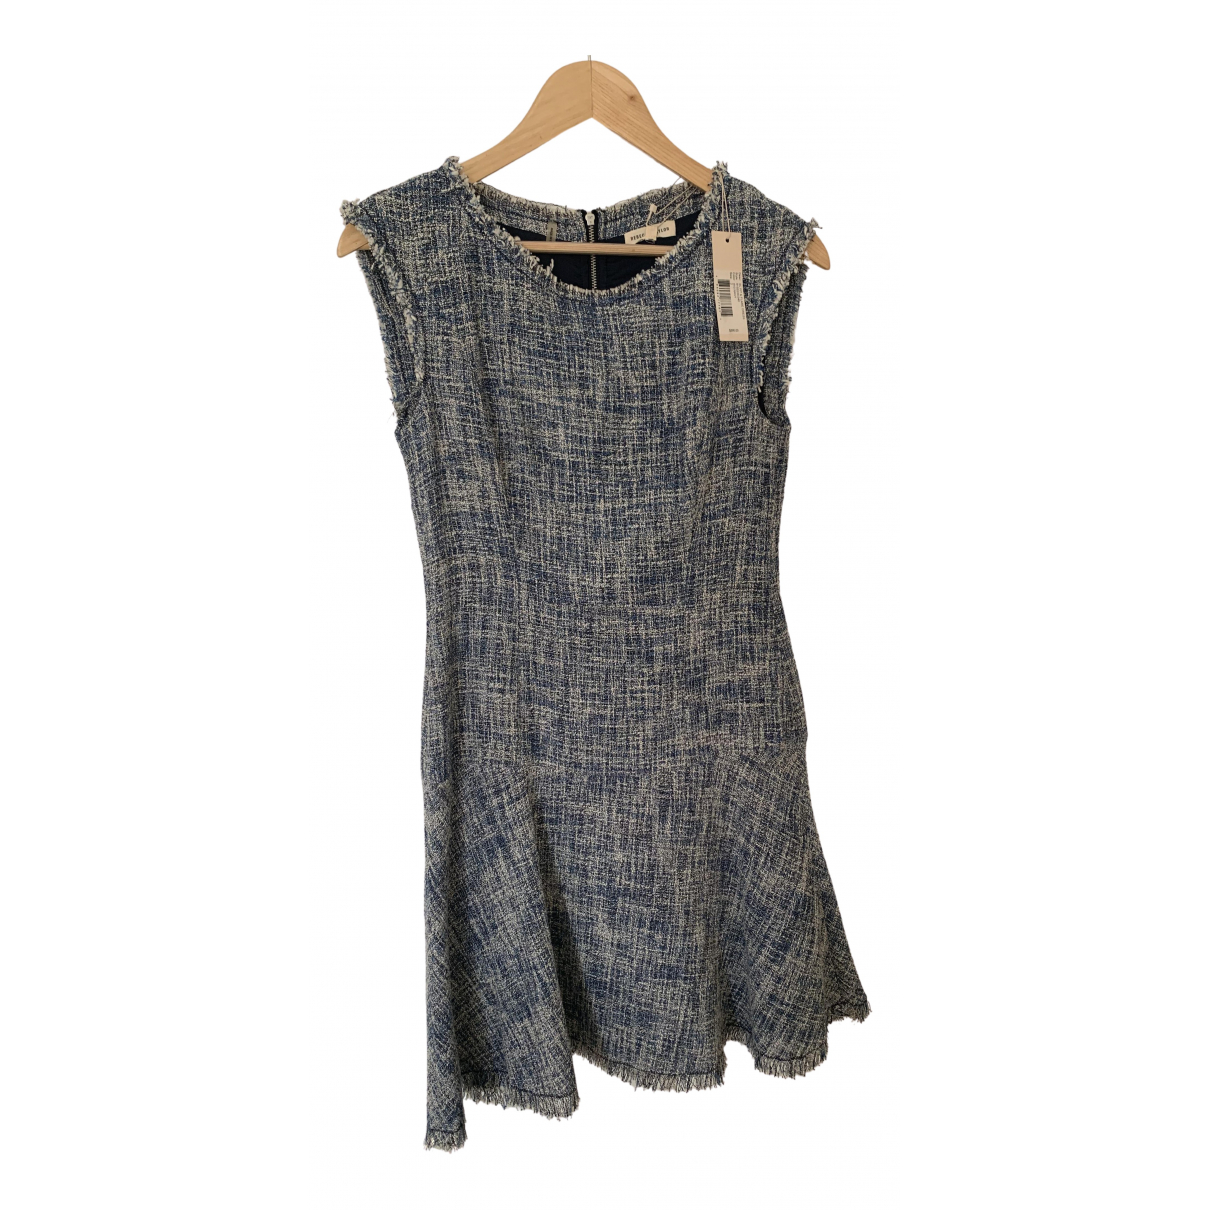 Rebecca Taylor - Robe   pour femme en tweed - multicolore